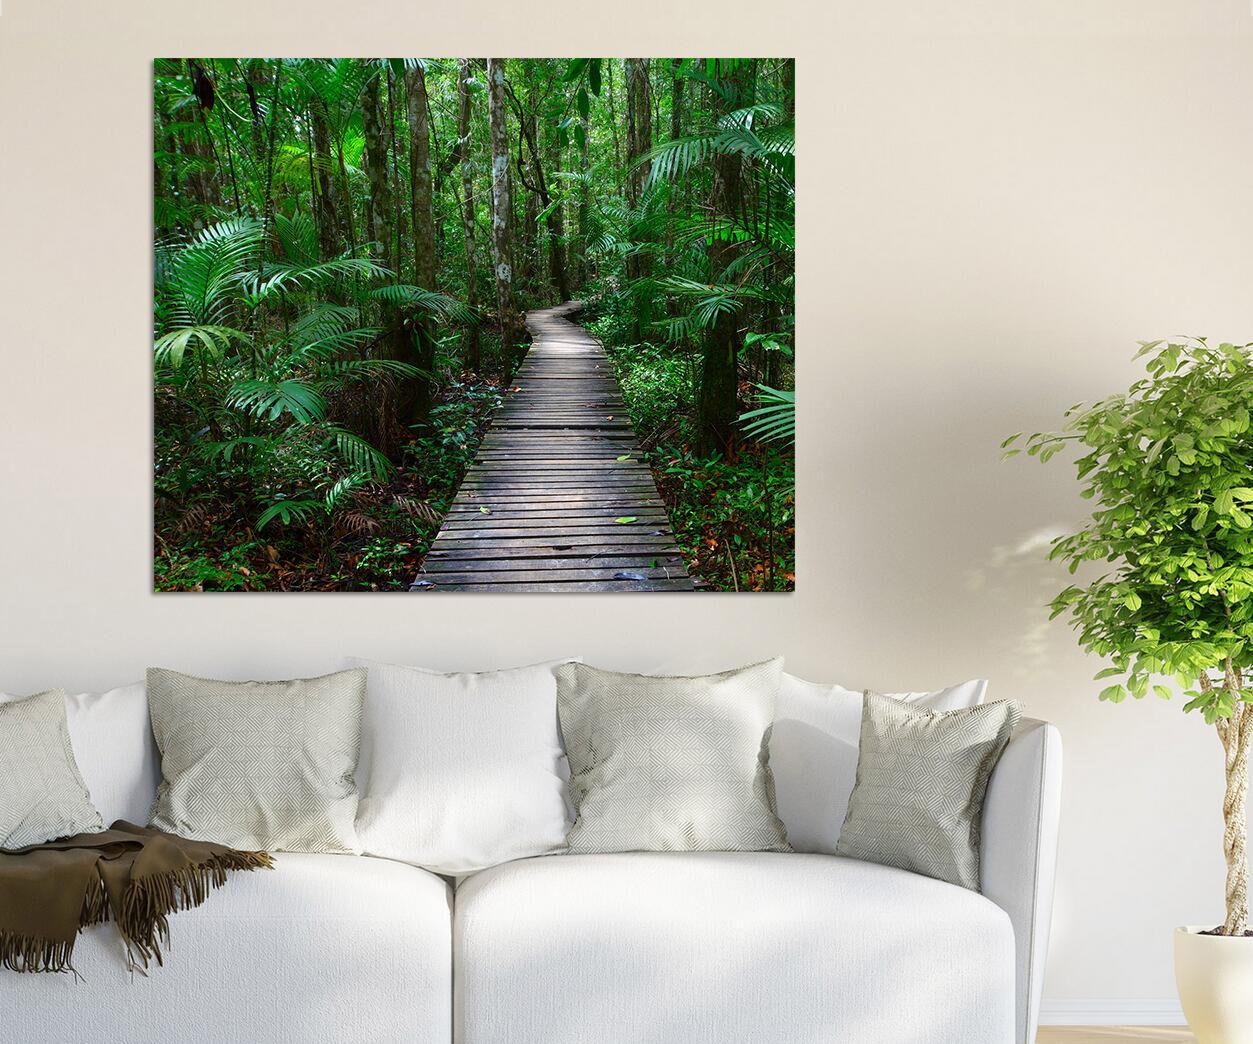 3D greene Wälder 387 Wandbild Fototapete BildTapete Familie AJSTORE DE